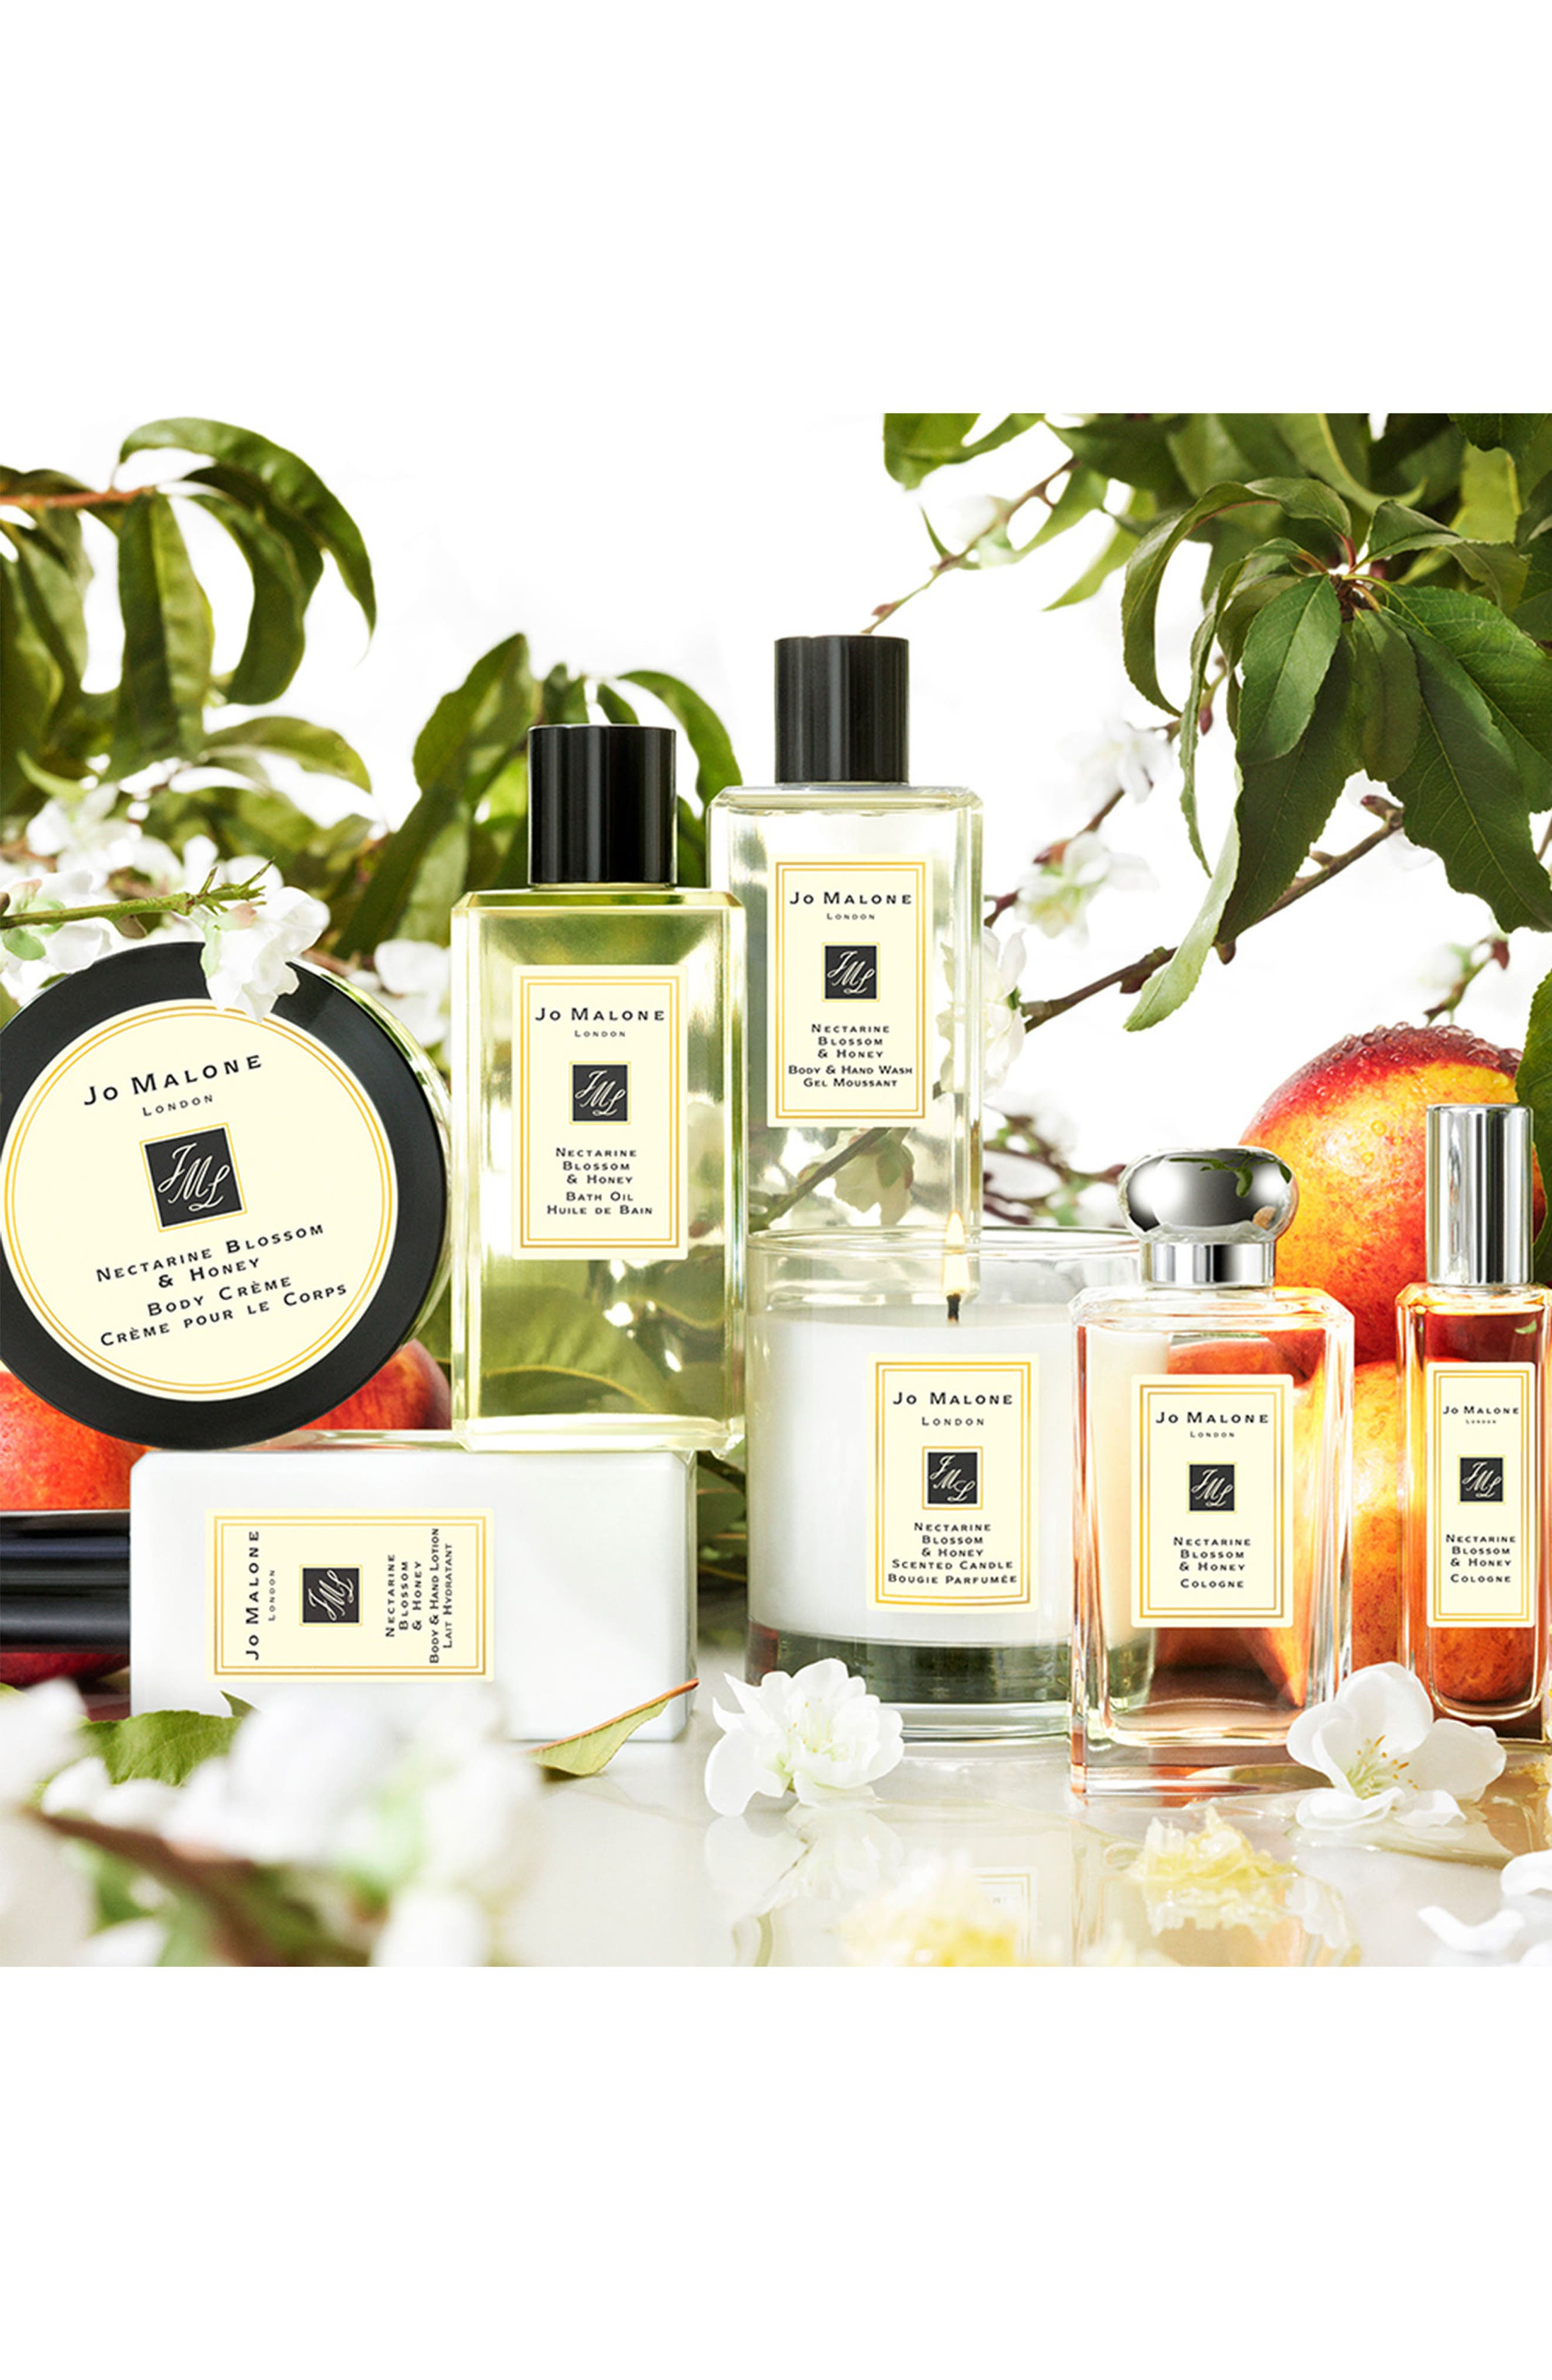 Alternate Image 3  - Jo Malone London™ 'Nectarine Blossom & Honey' Bath Oil